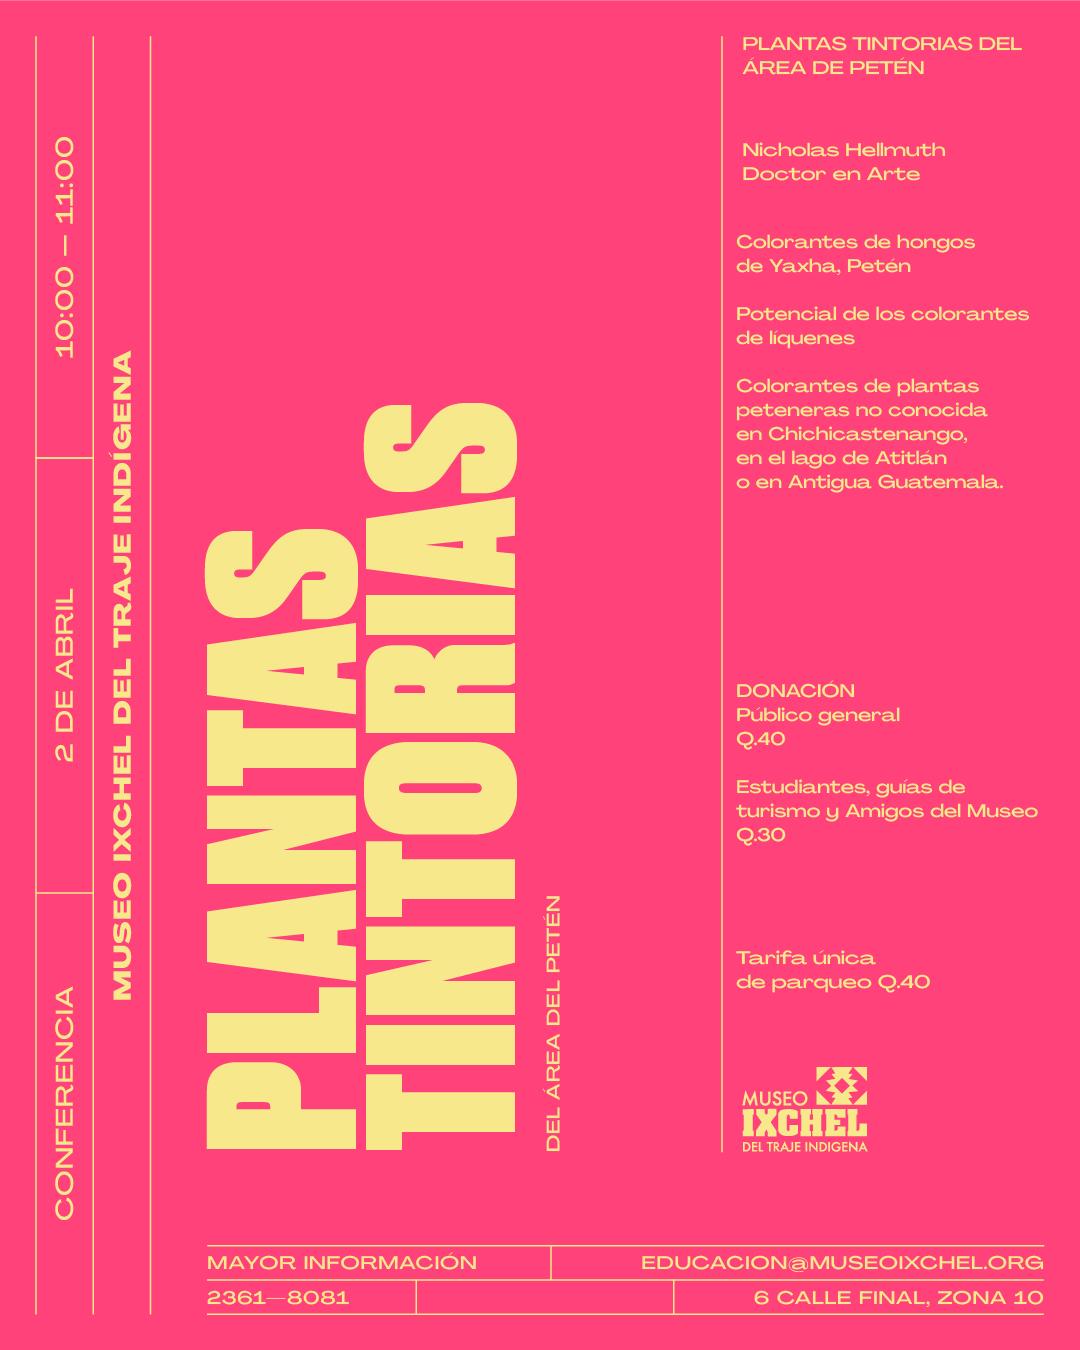 Dye-colorants-lecture-plantas-tintorias-Abril-2-2019-Museo-Ixchel-FLAAR-MESOAMERICA